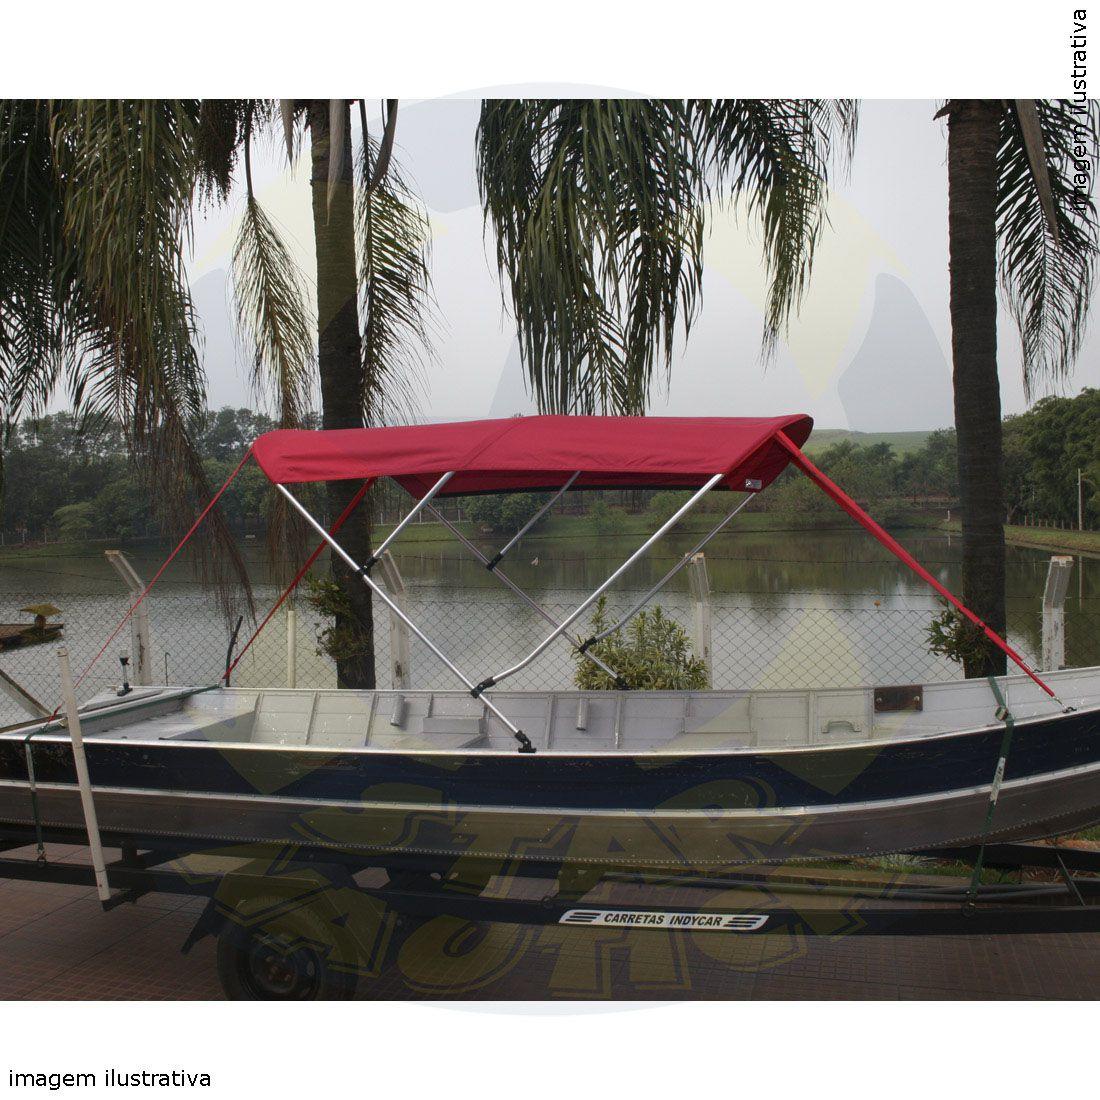 Capota Toldo Barco Karib 500 Vinílica 3 Arcos Tubo 1 1/4